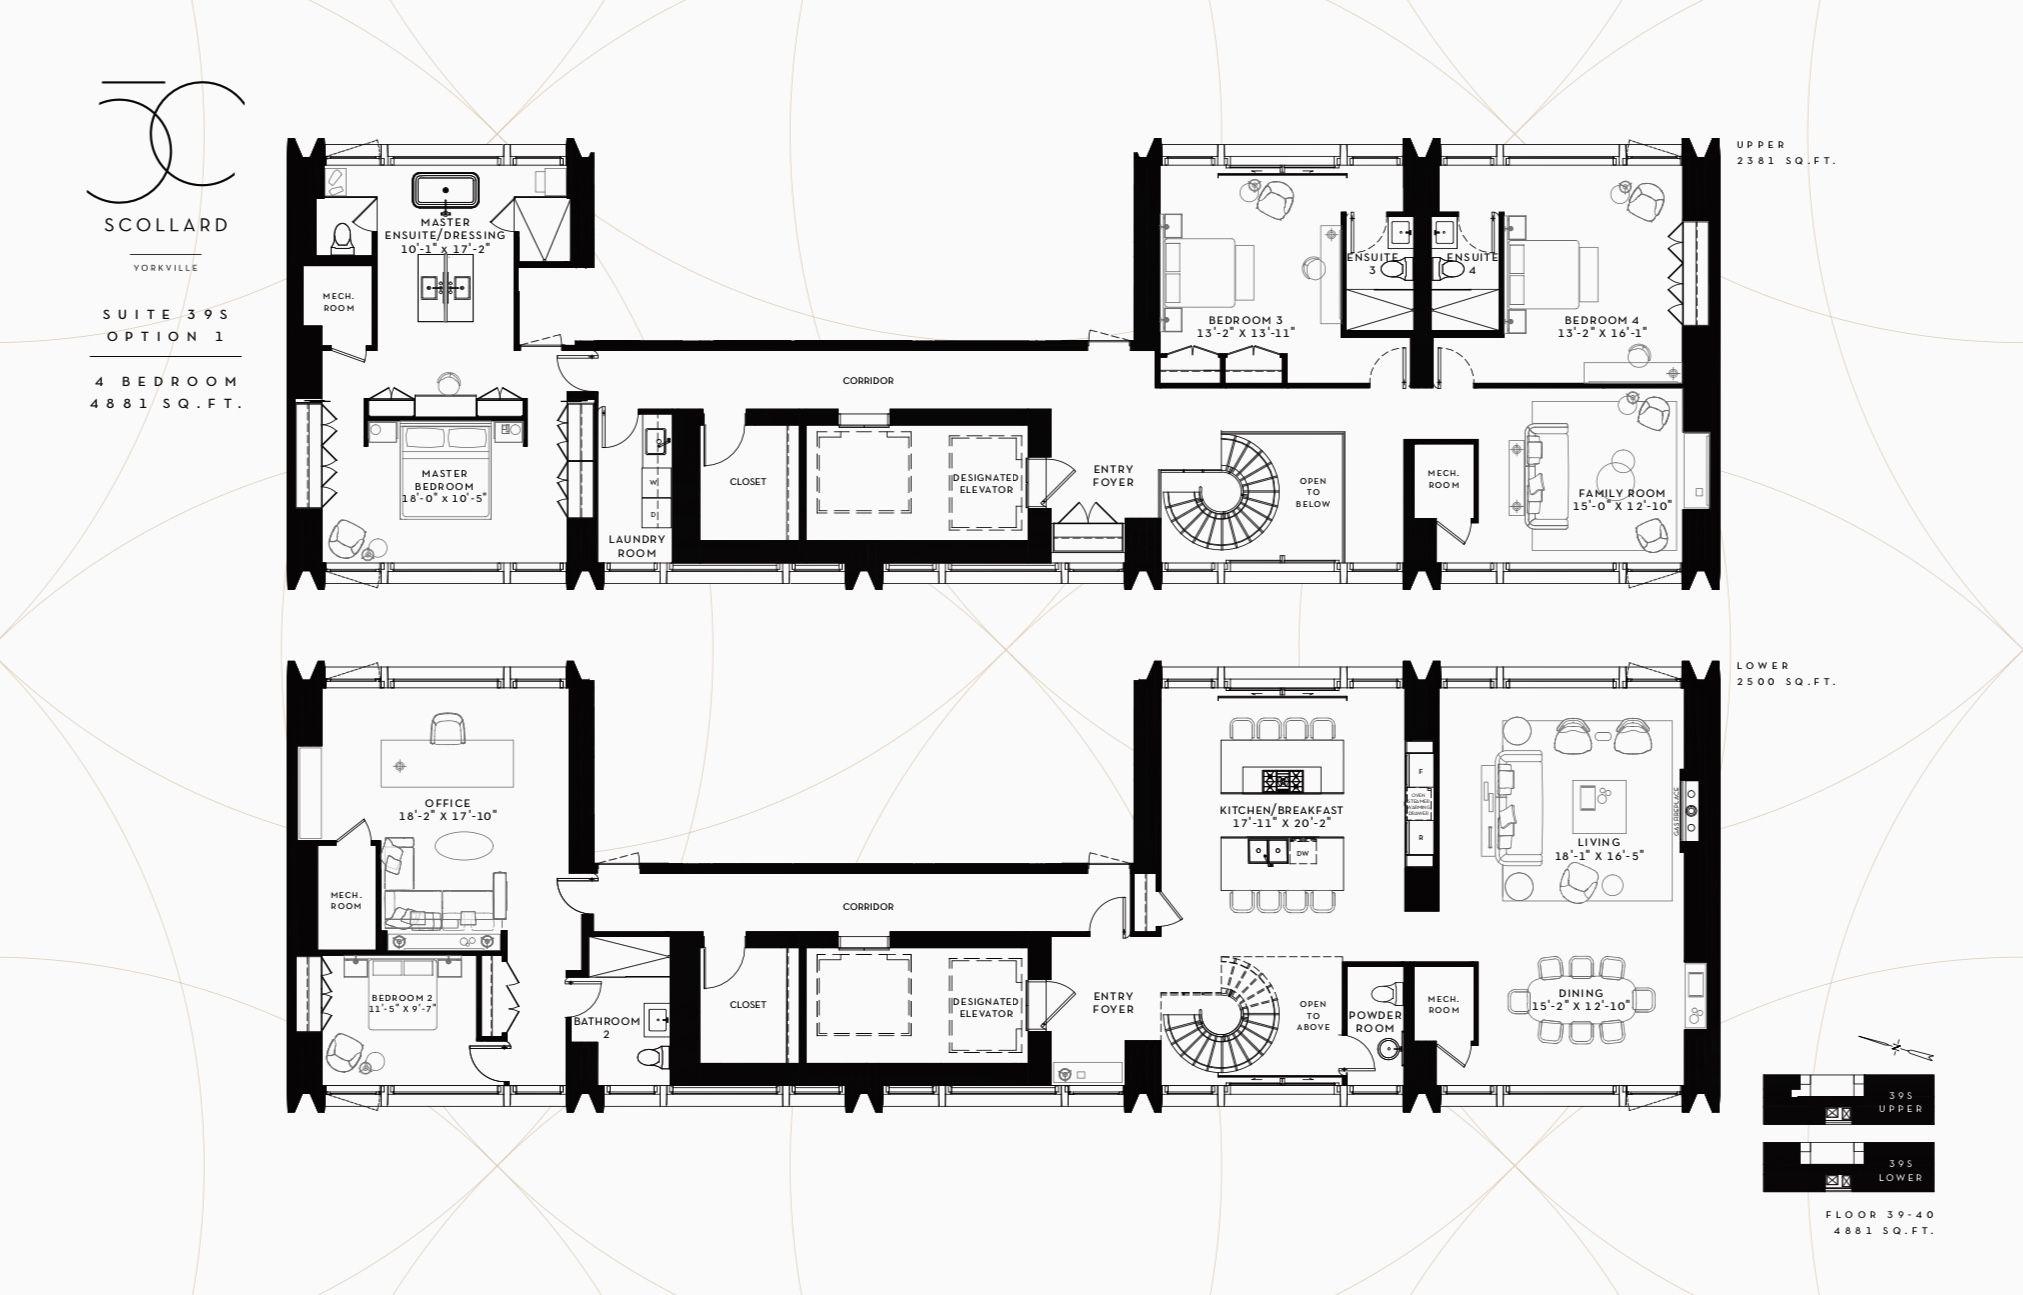 50 Scollard Yorkville Toronto Suite 39s Option 1 Floor Plans House Plans Plan Design